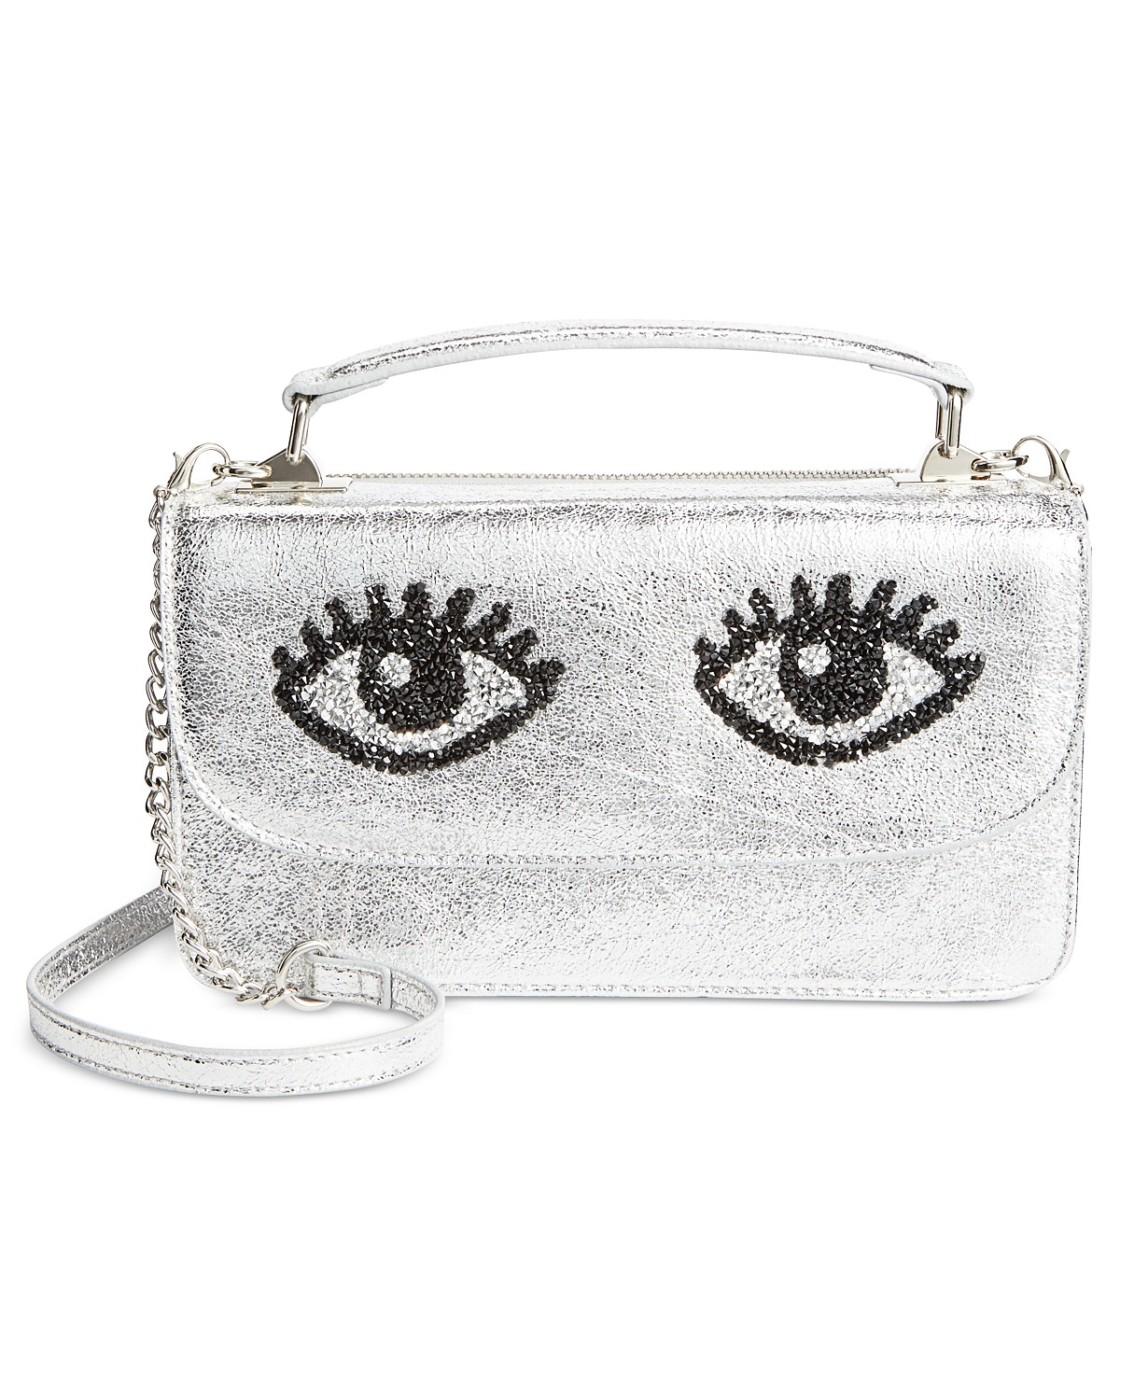 4210059e13d9 Betsey Johnson Women s Silver Eyes Top-Handle Crossbody Bag